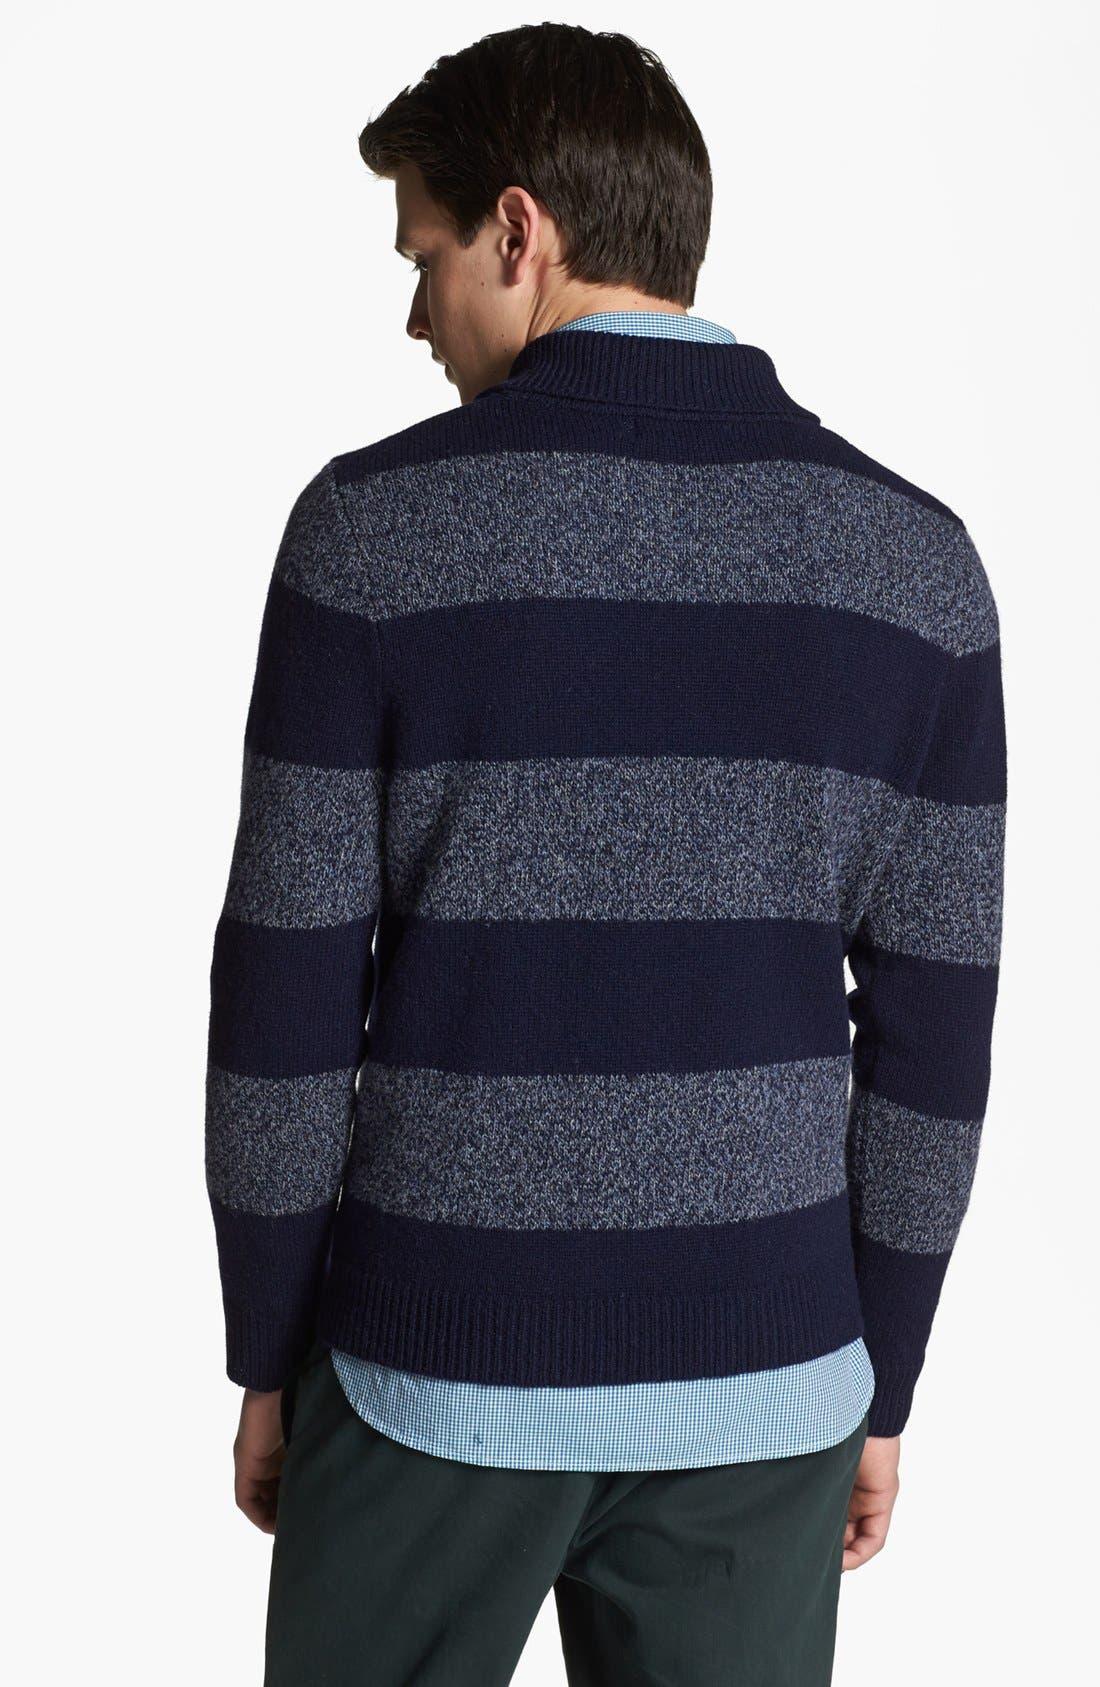 SHIPLEY & HALMOS, 'Earnest' Stripe Wool Shawl Collar Sweater, Alternate thumbnail 2, color, 415